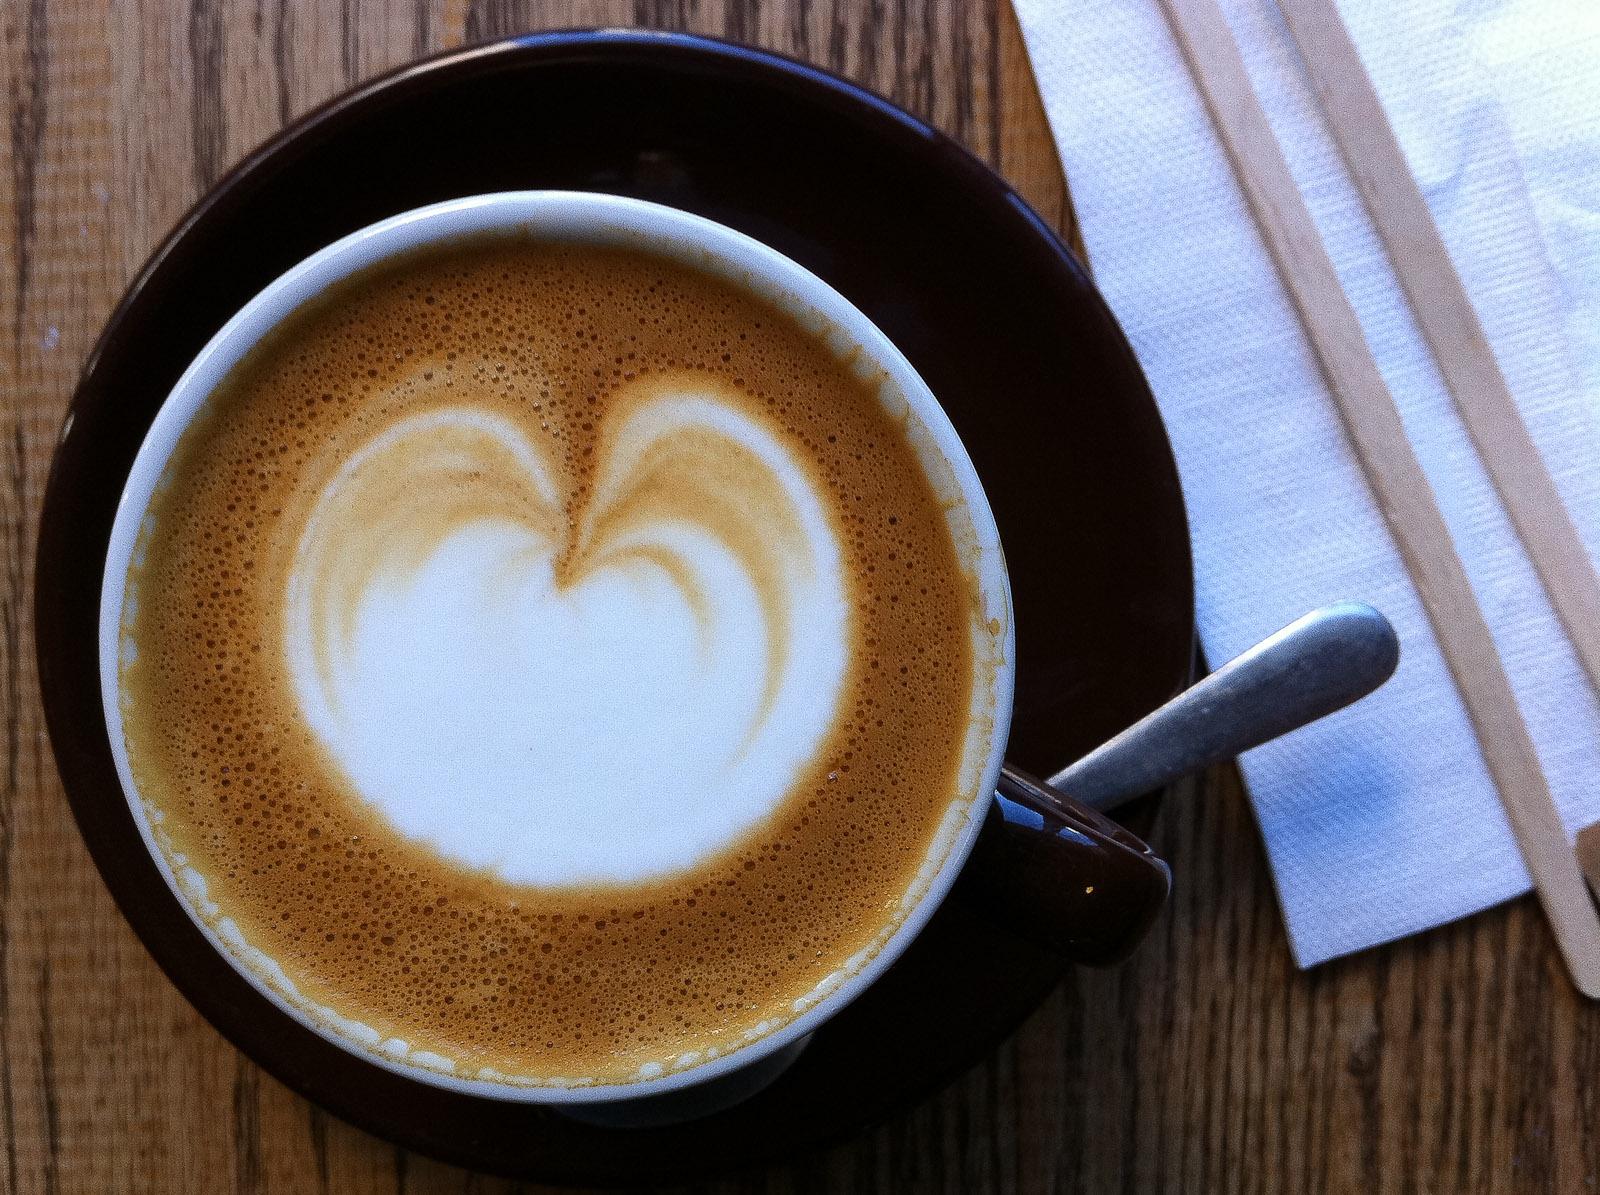 Cafe Myriade - Latte